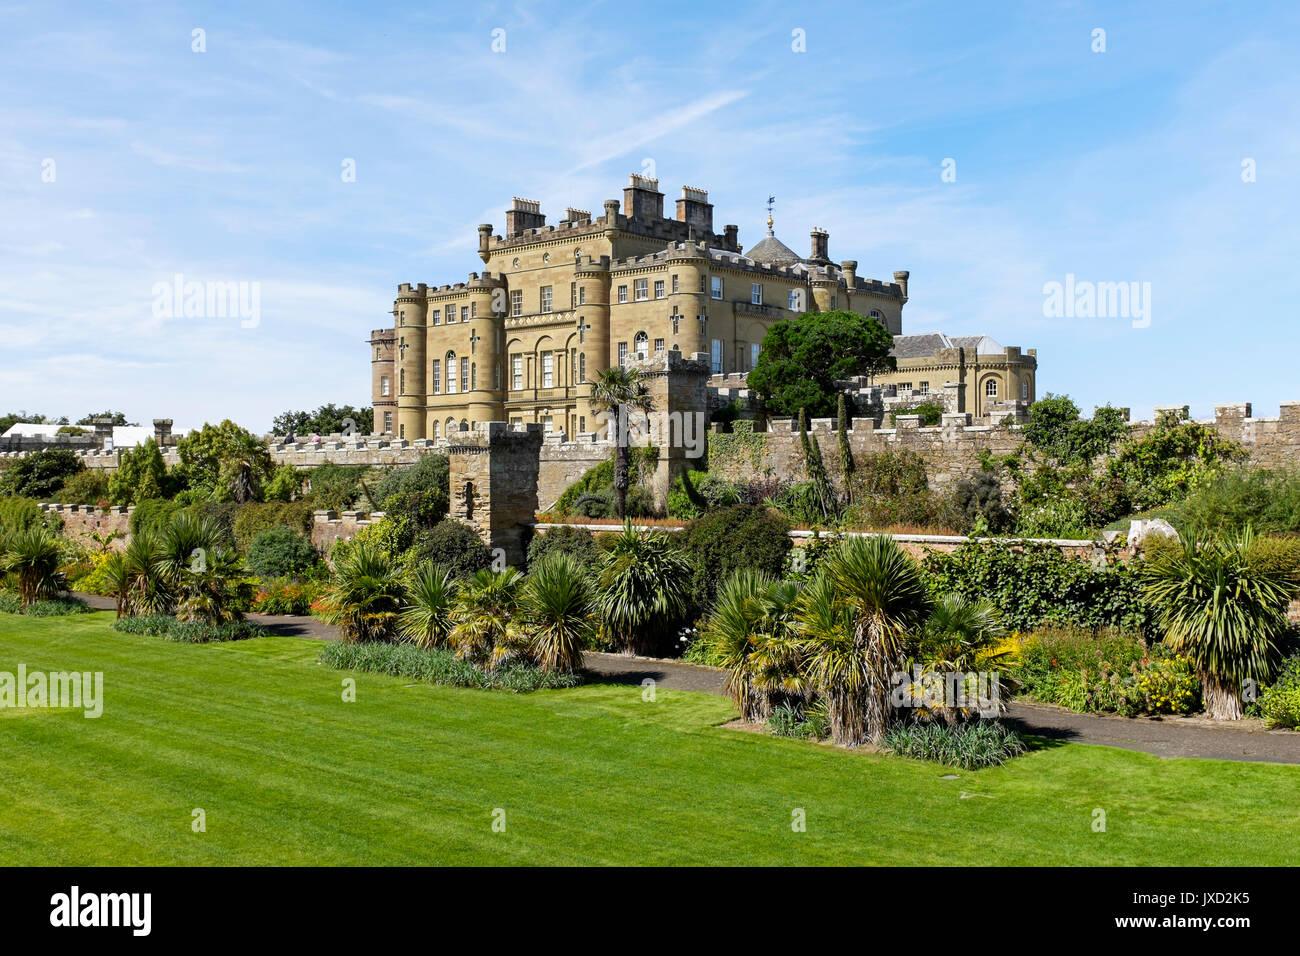 Culzean Castle, near Ayr, Ayrshire, Scotland, UK - Stock Image